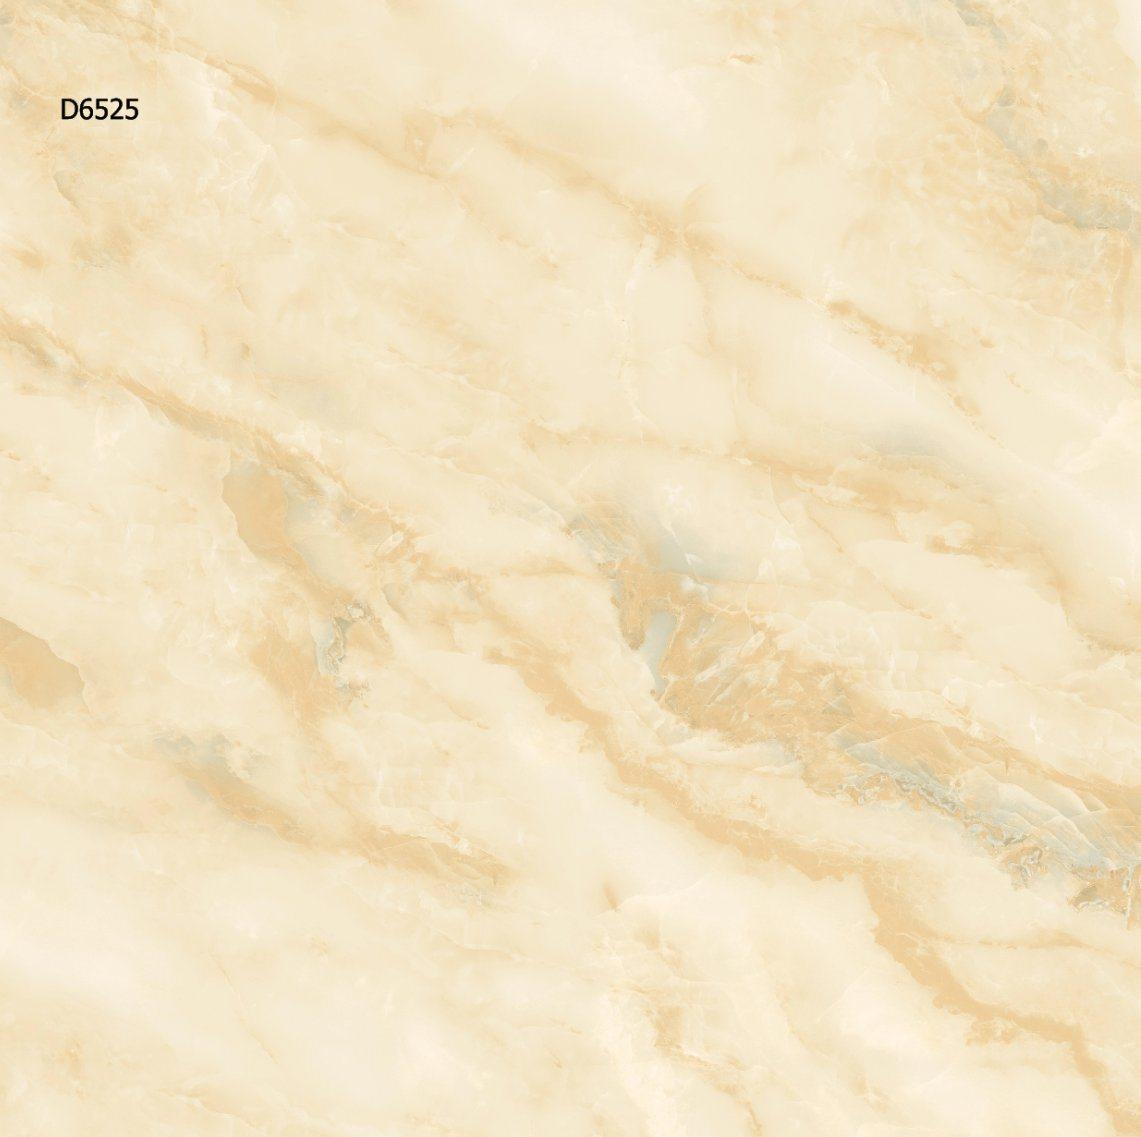 China 600600mm Wood Grain Designs Ceramic Floor Tiles For Bedroom